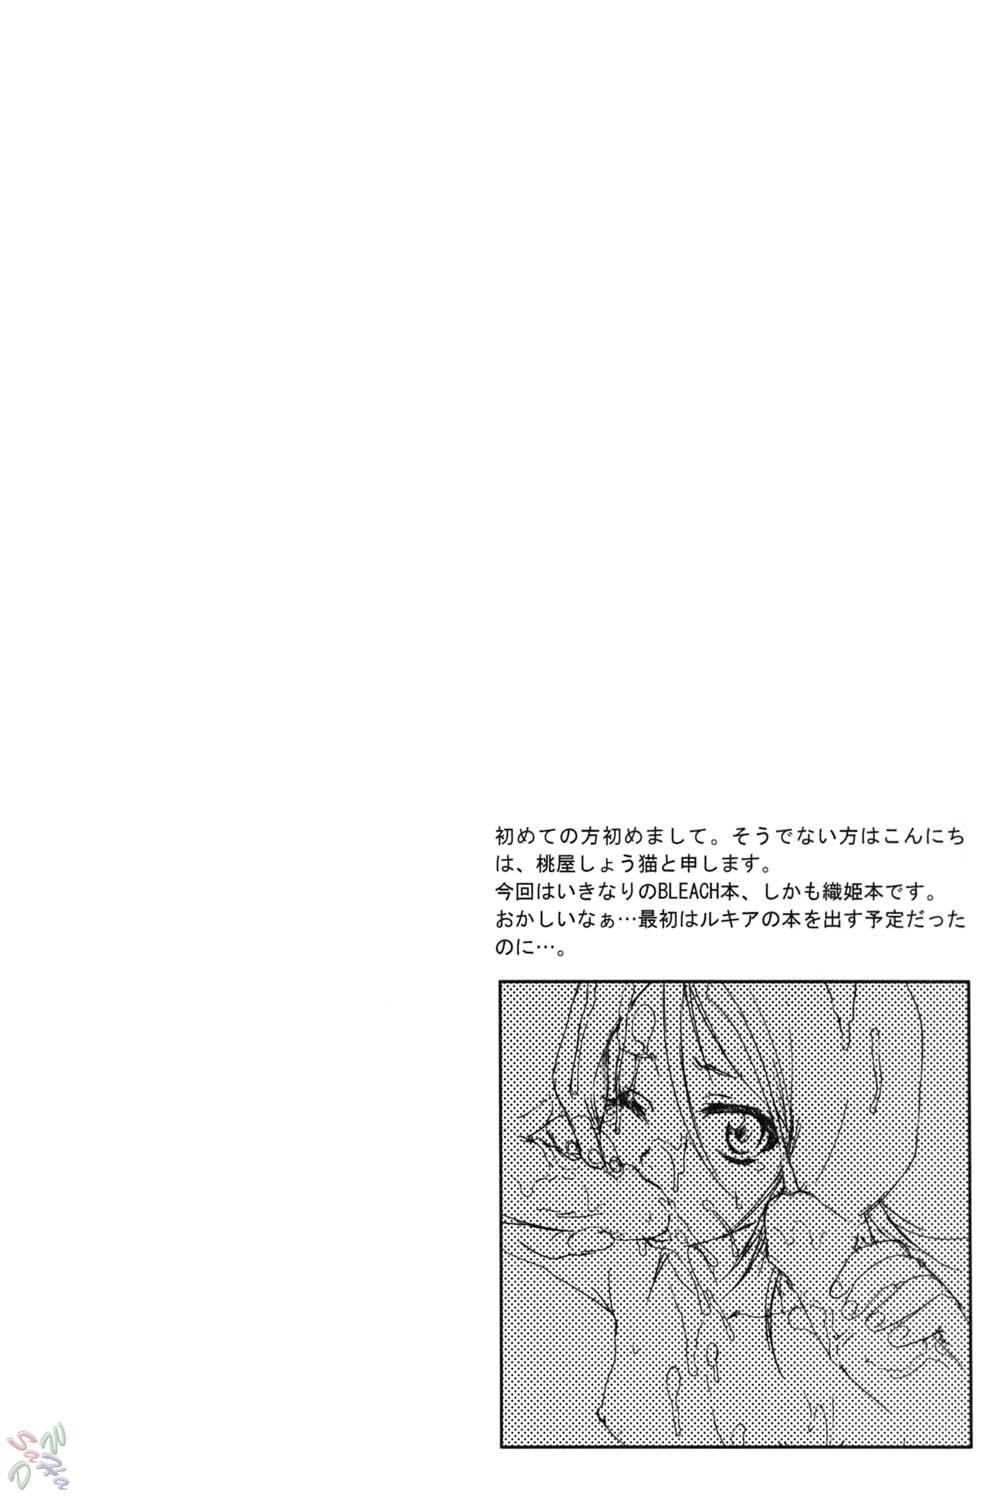 Orihime-chan de GO 2